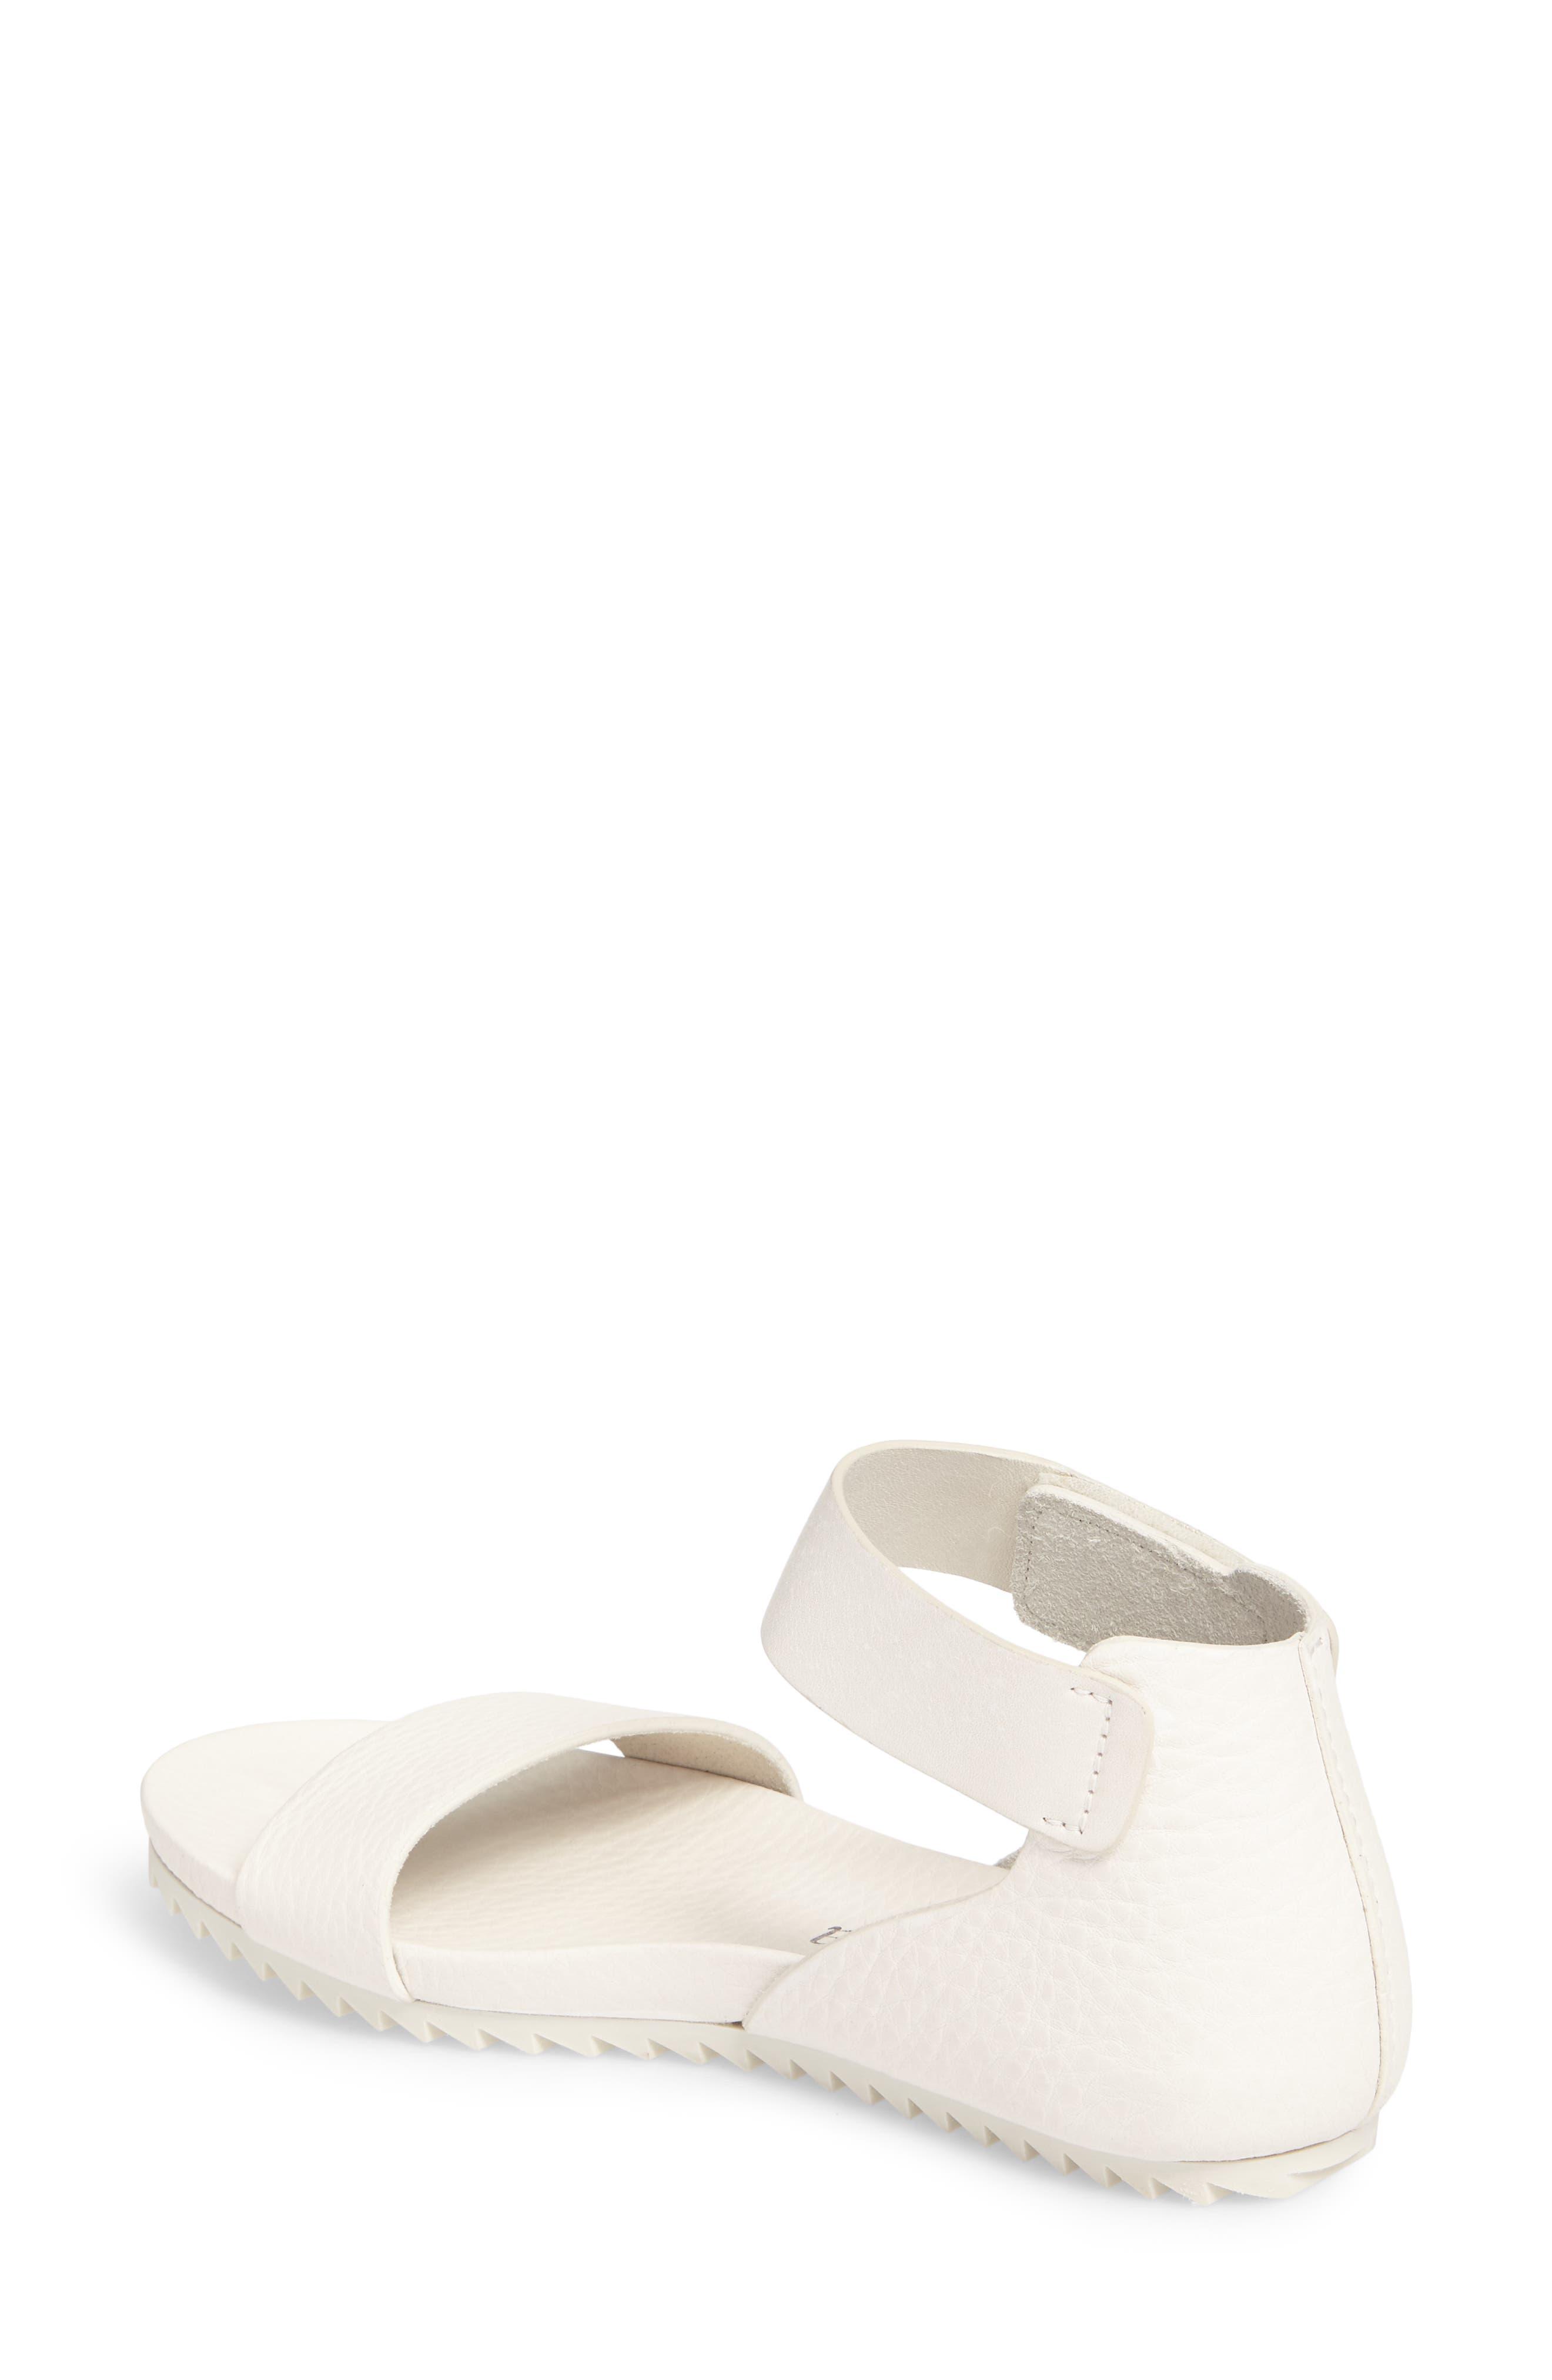 Jalila Ankle Strap Sandal,                             Alternate thumbnail 5, color,                             Chalk Cervo